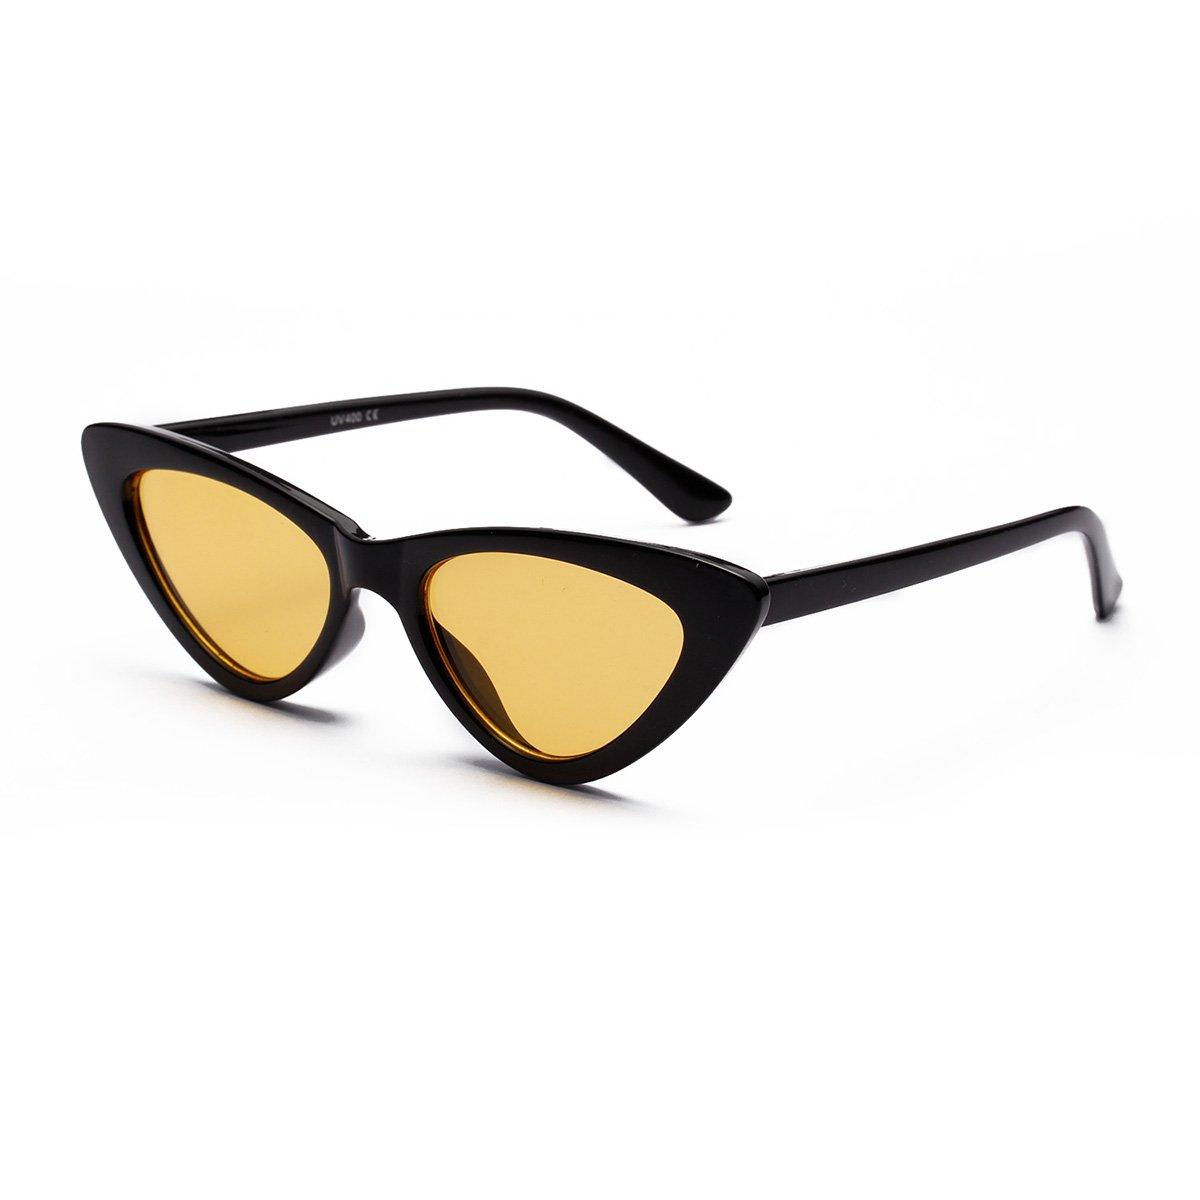 ad2c85f3f6fed Retro Narrow Cat Eye Sunglasses Para Mujeres Clout Goggles Plastic Frame  Universal